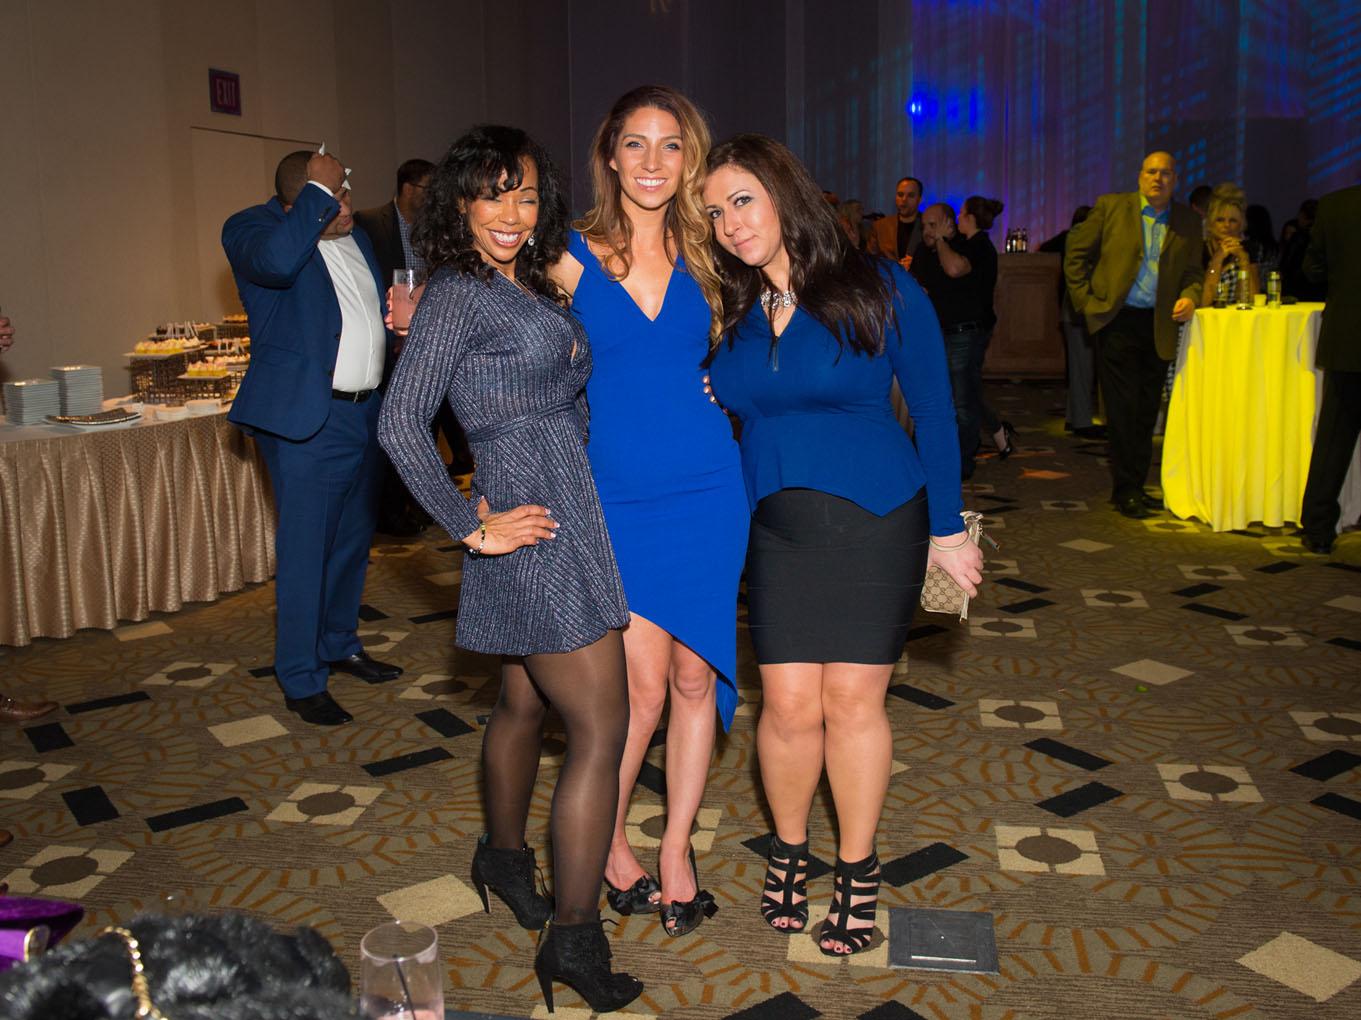 2015-12-09 ReMax Corpoarte Event - The Borgata - Atlantic City NJ - Photo Sesh - 2015-5371.jpg